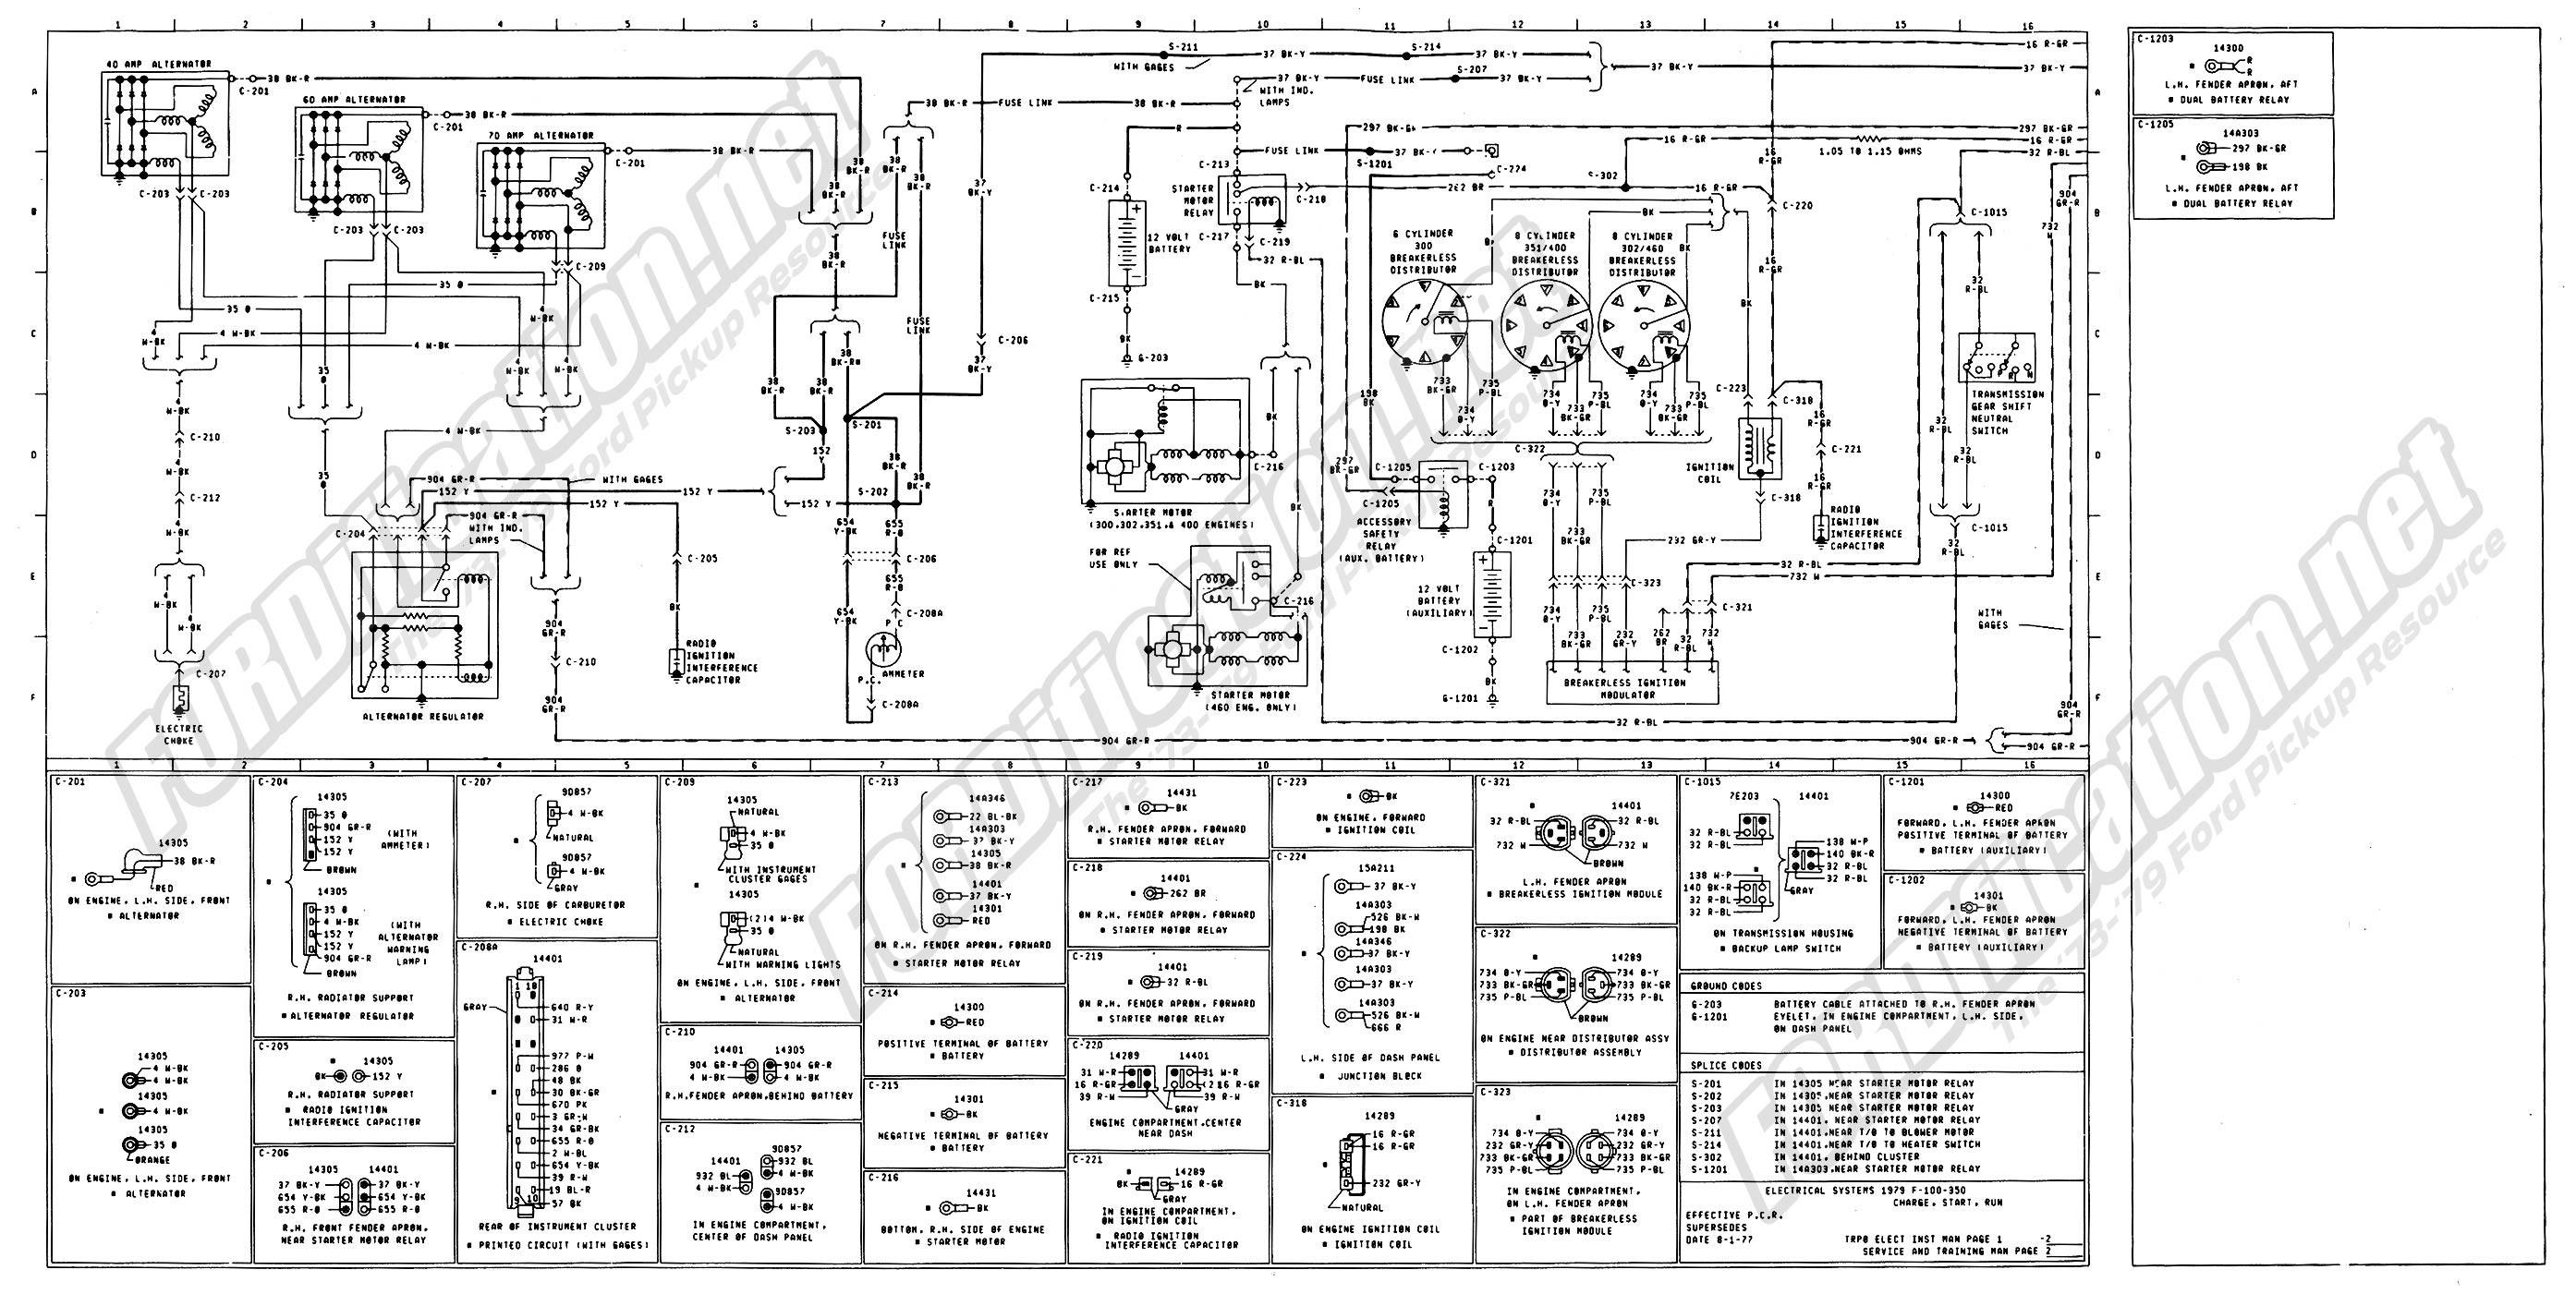 1985 chevy c10 alternator diagram